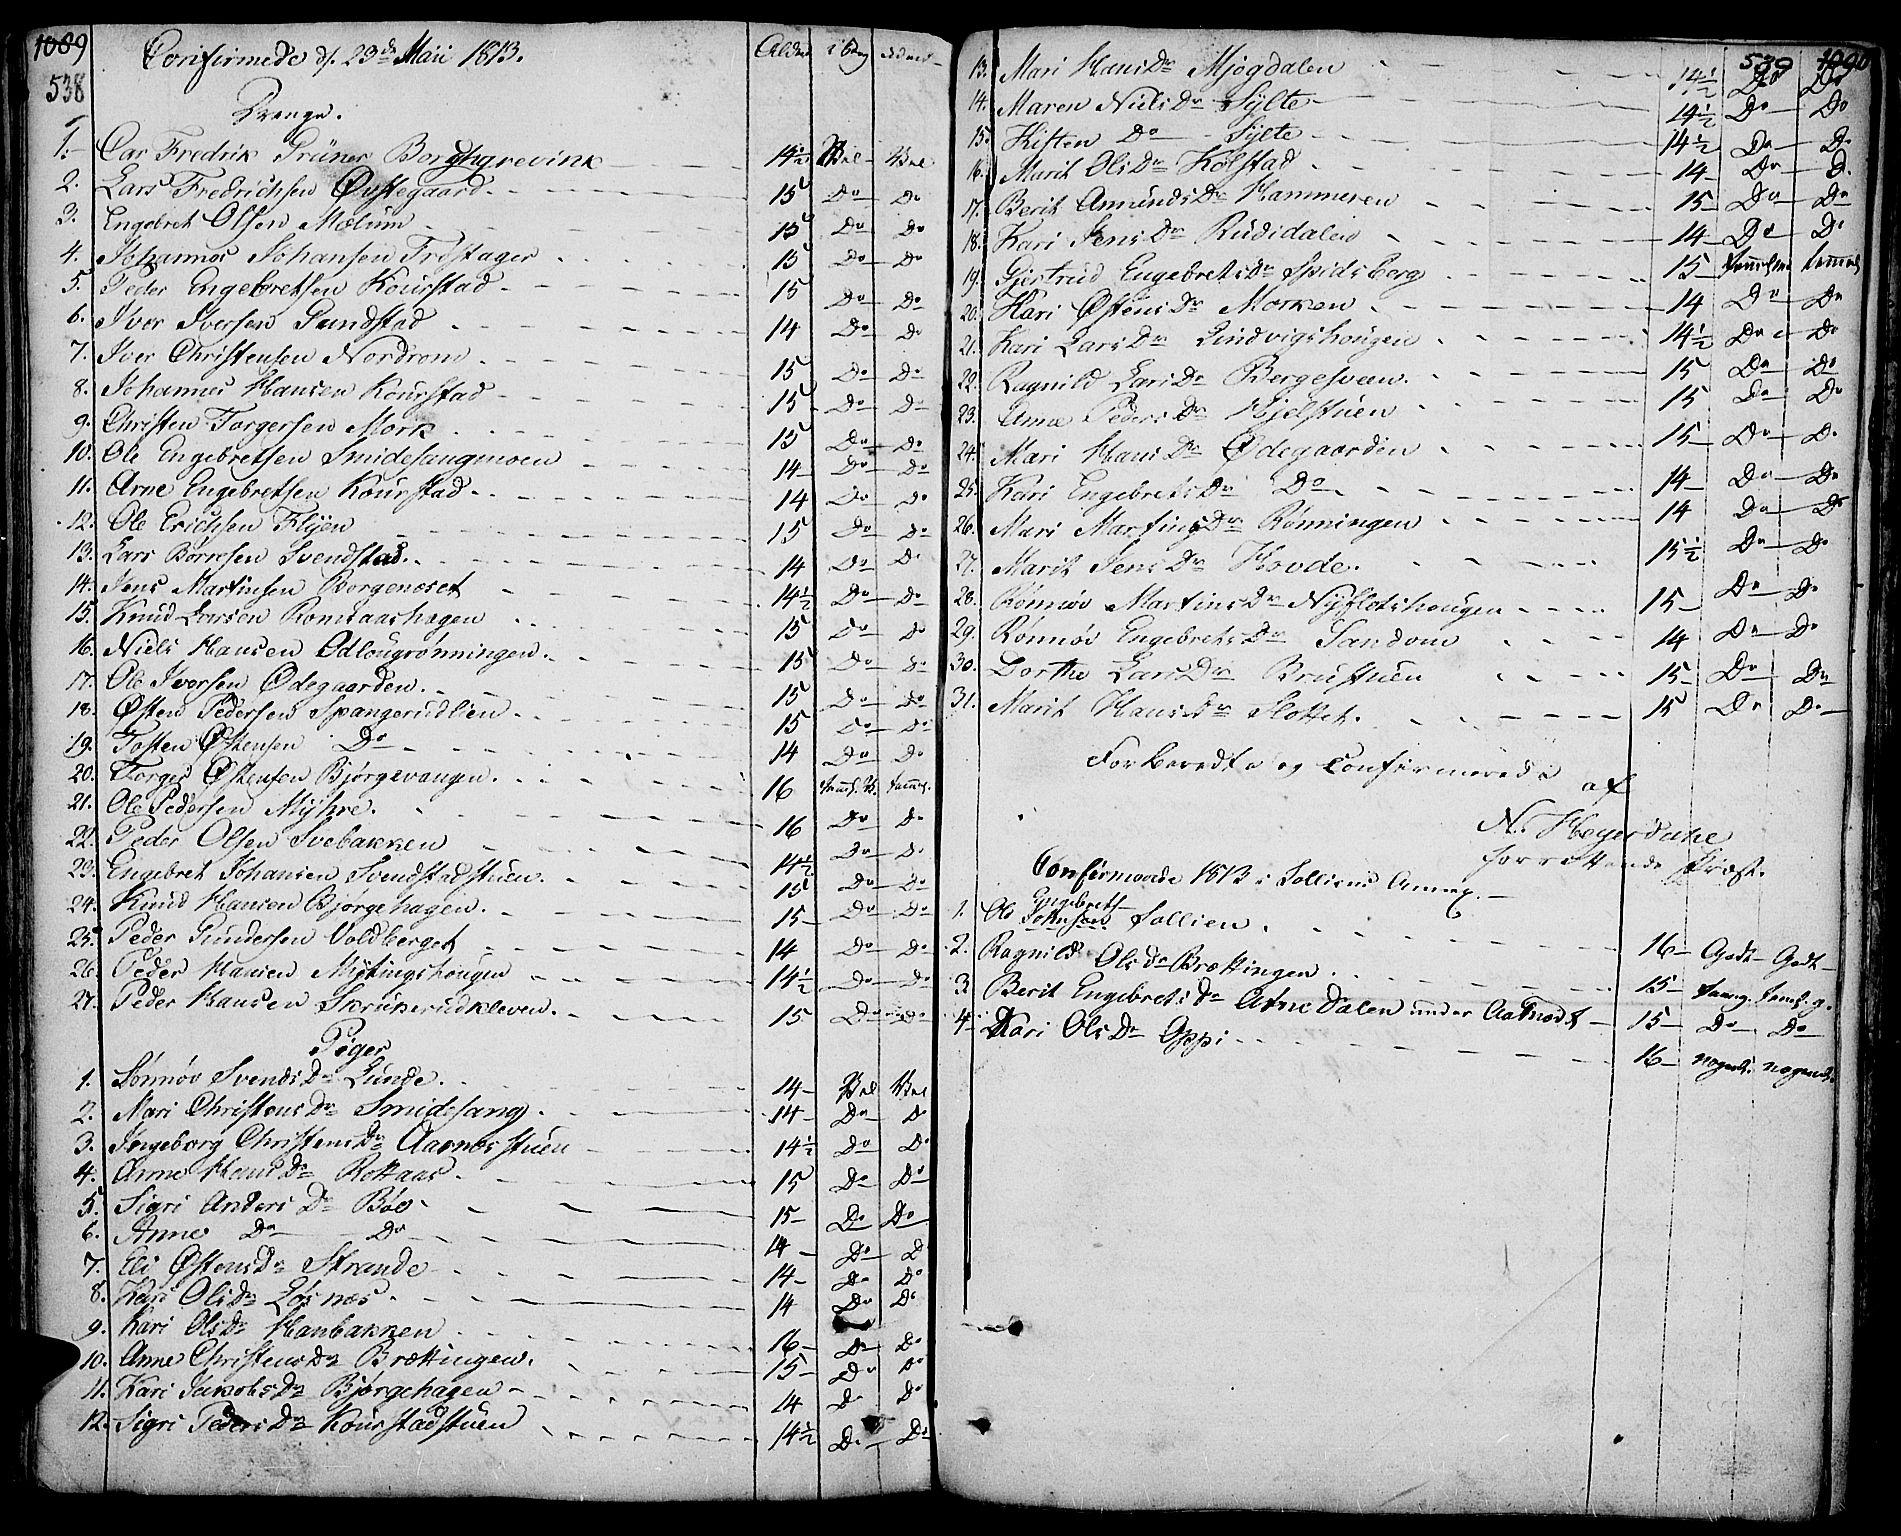 SAH, Ringebu prestekontor, Ministerialbok nr. 3, 1781-1820, s. 538-539